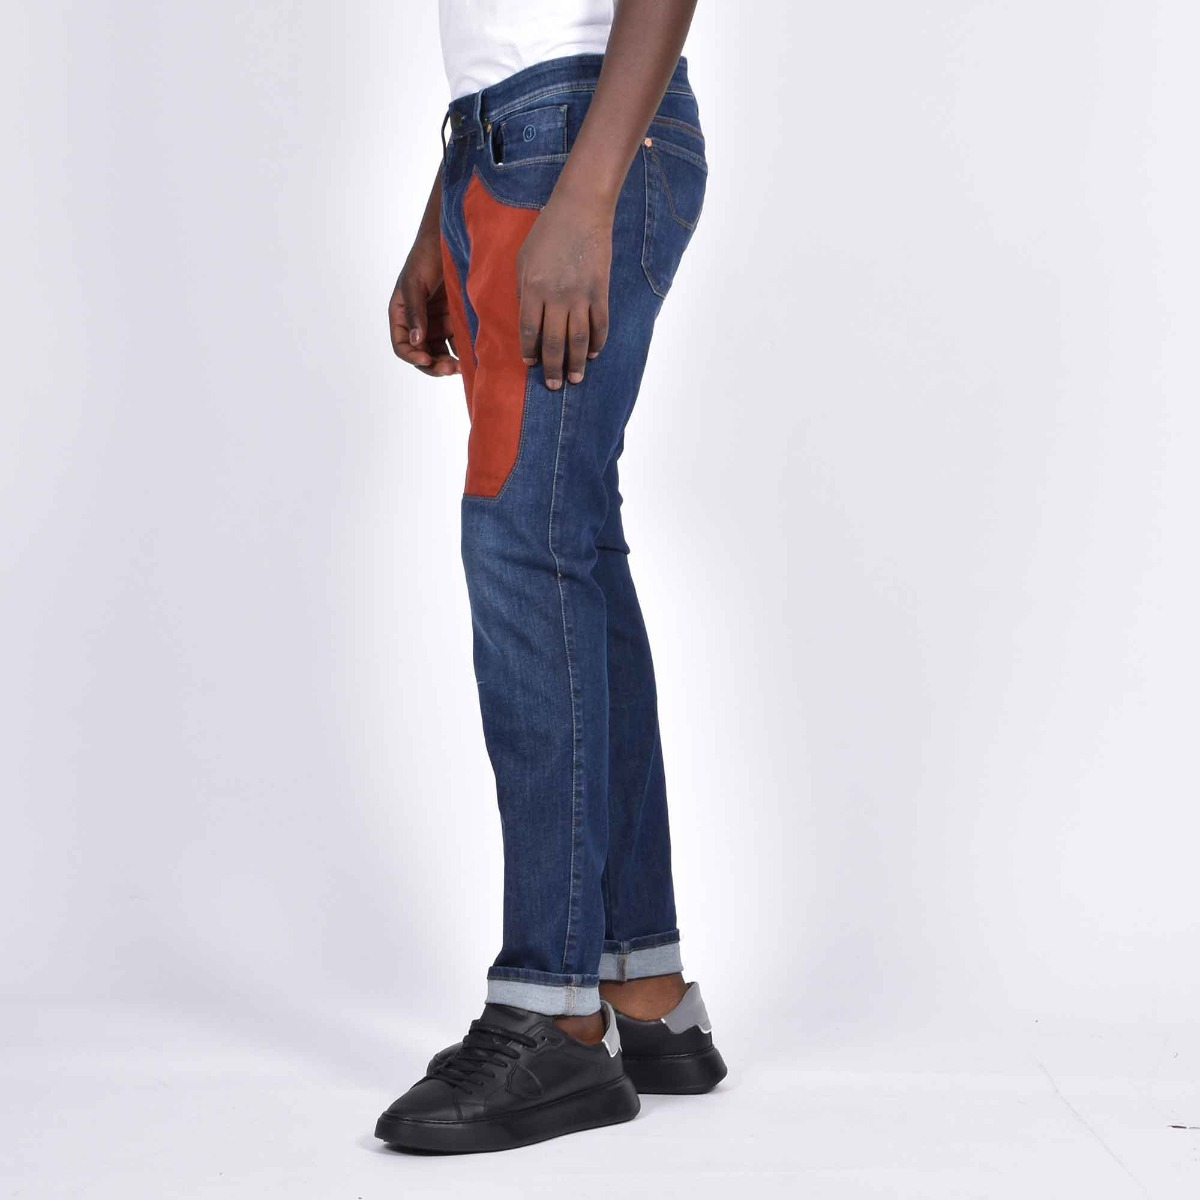 Jeans toppa alcantara bordeaux- Denim